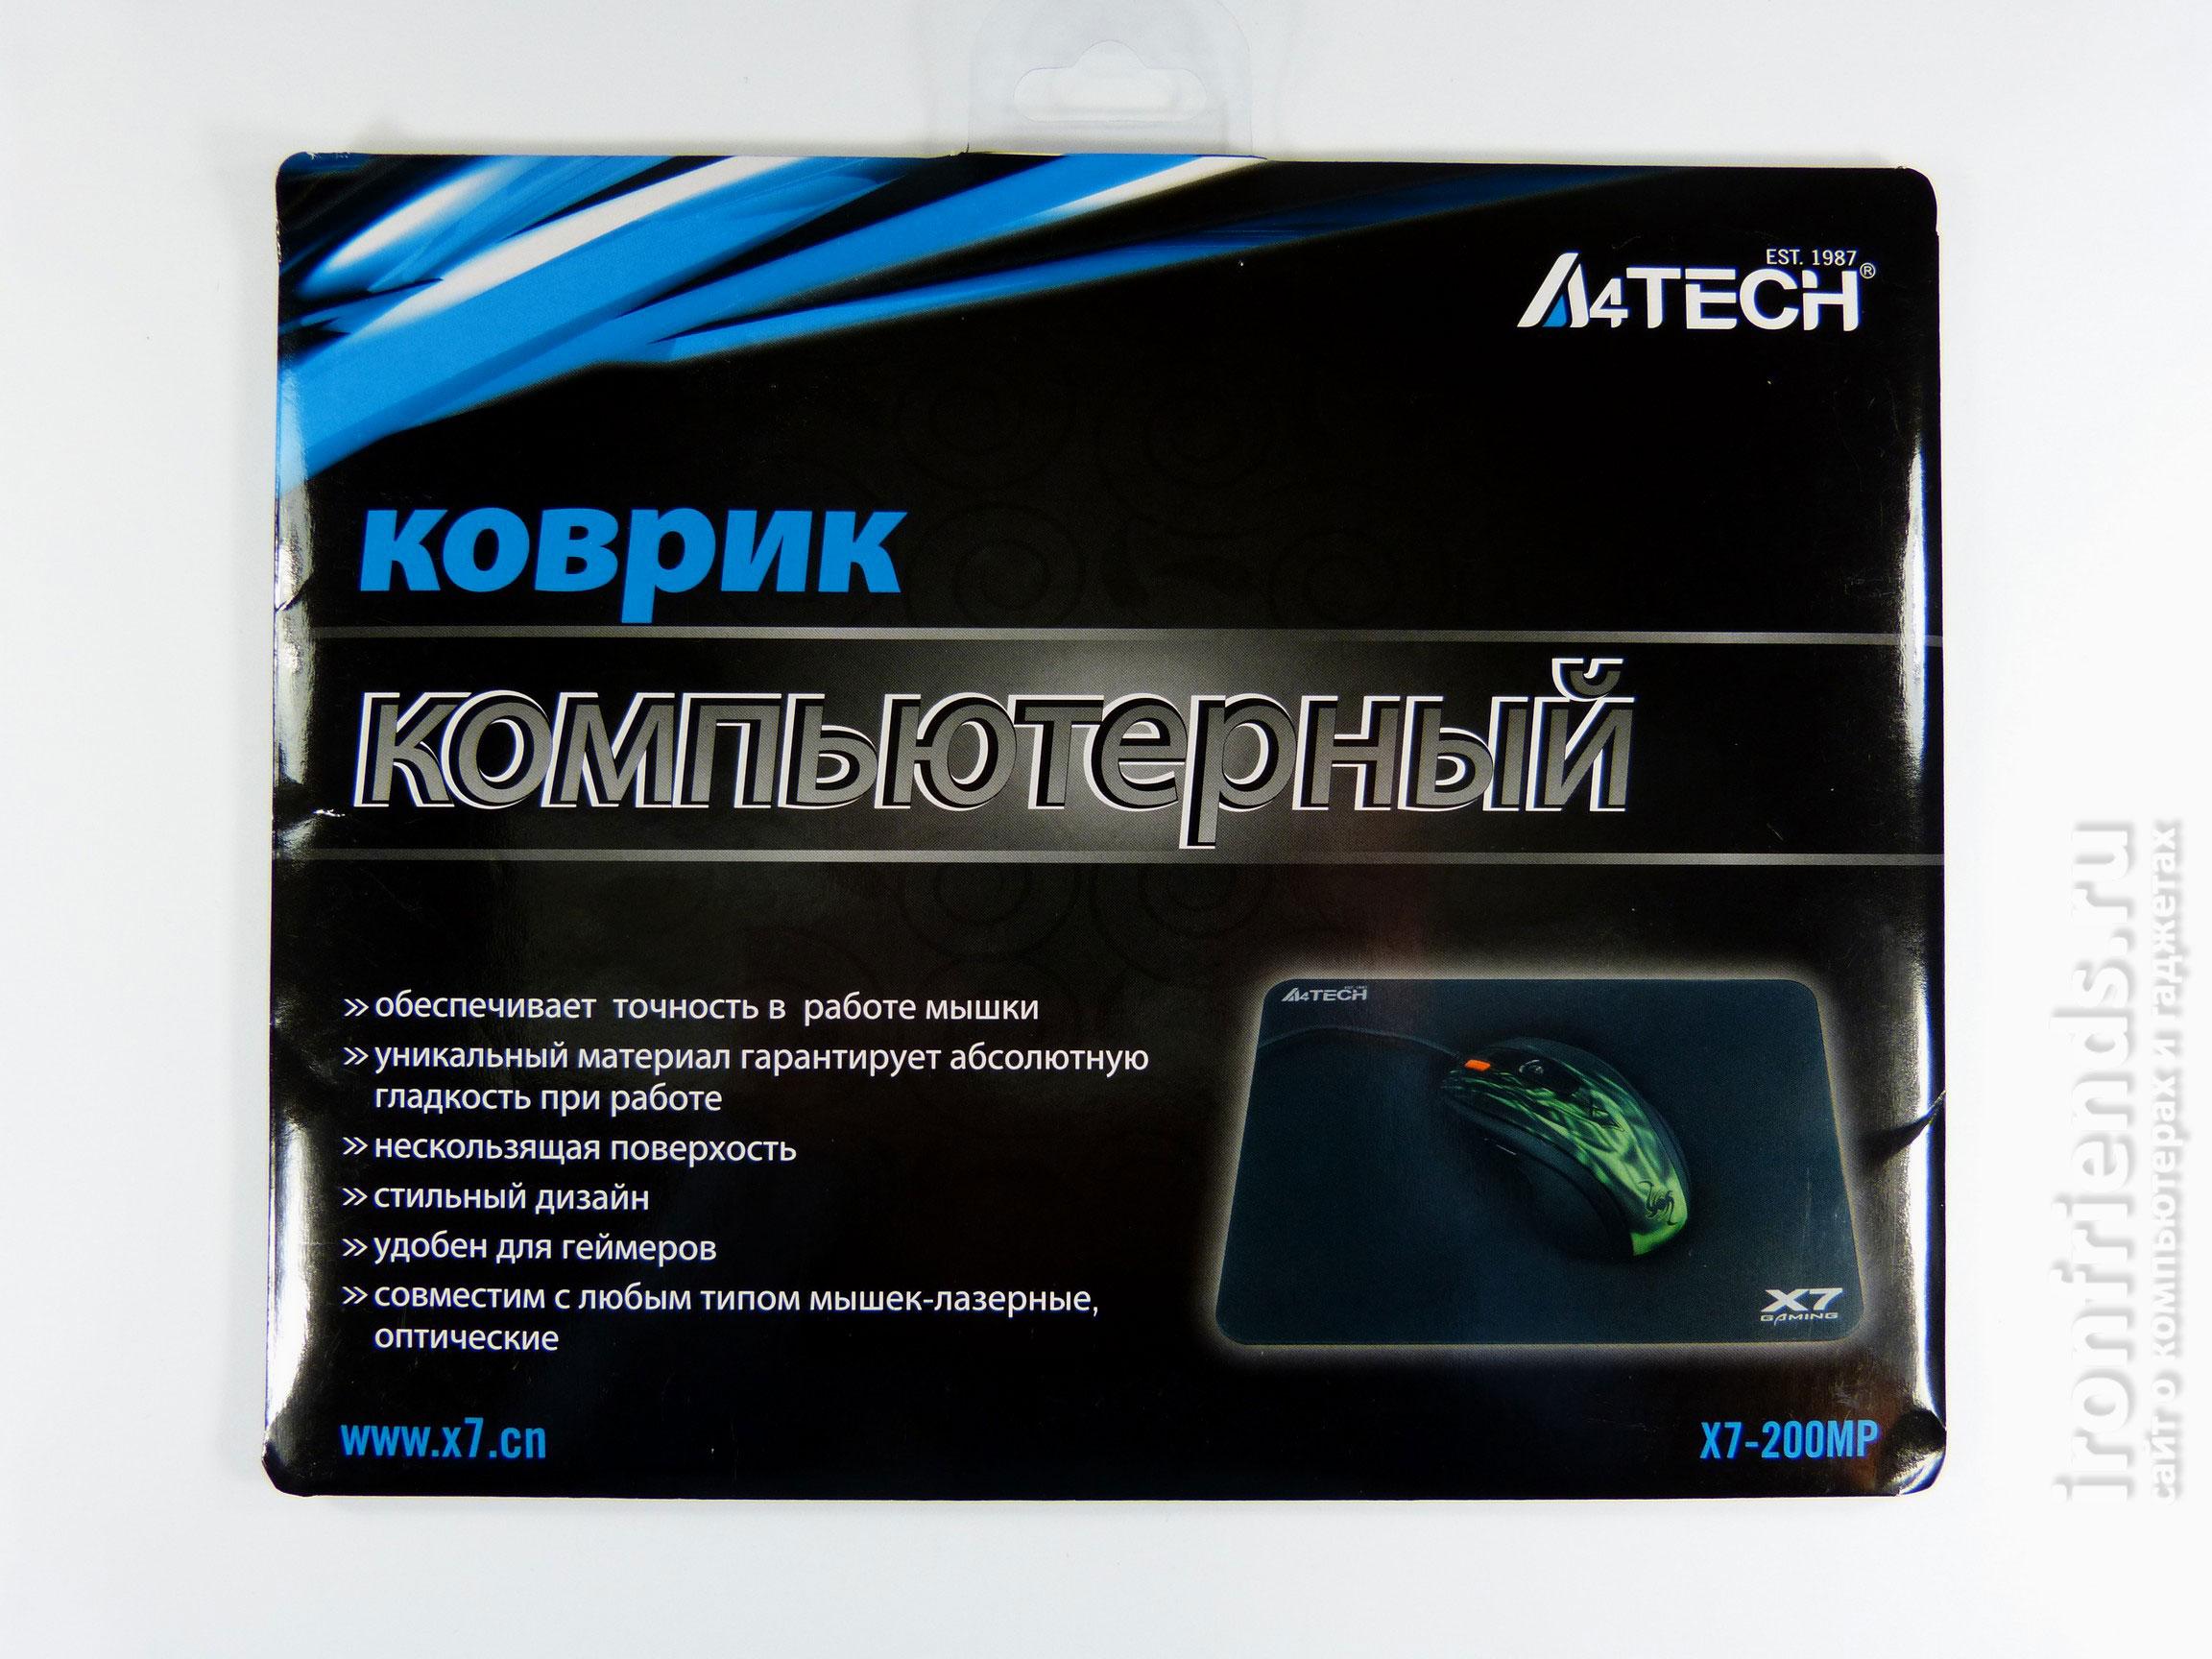 Embalagem A4TECH X7-200MP.